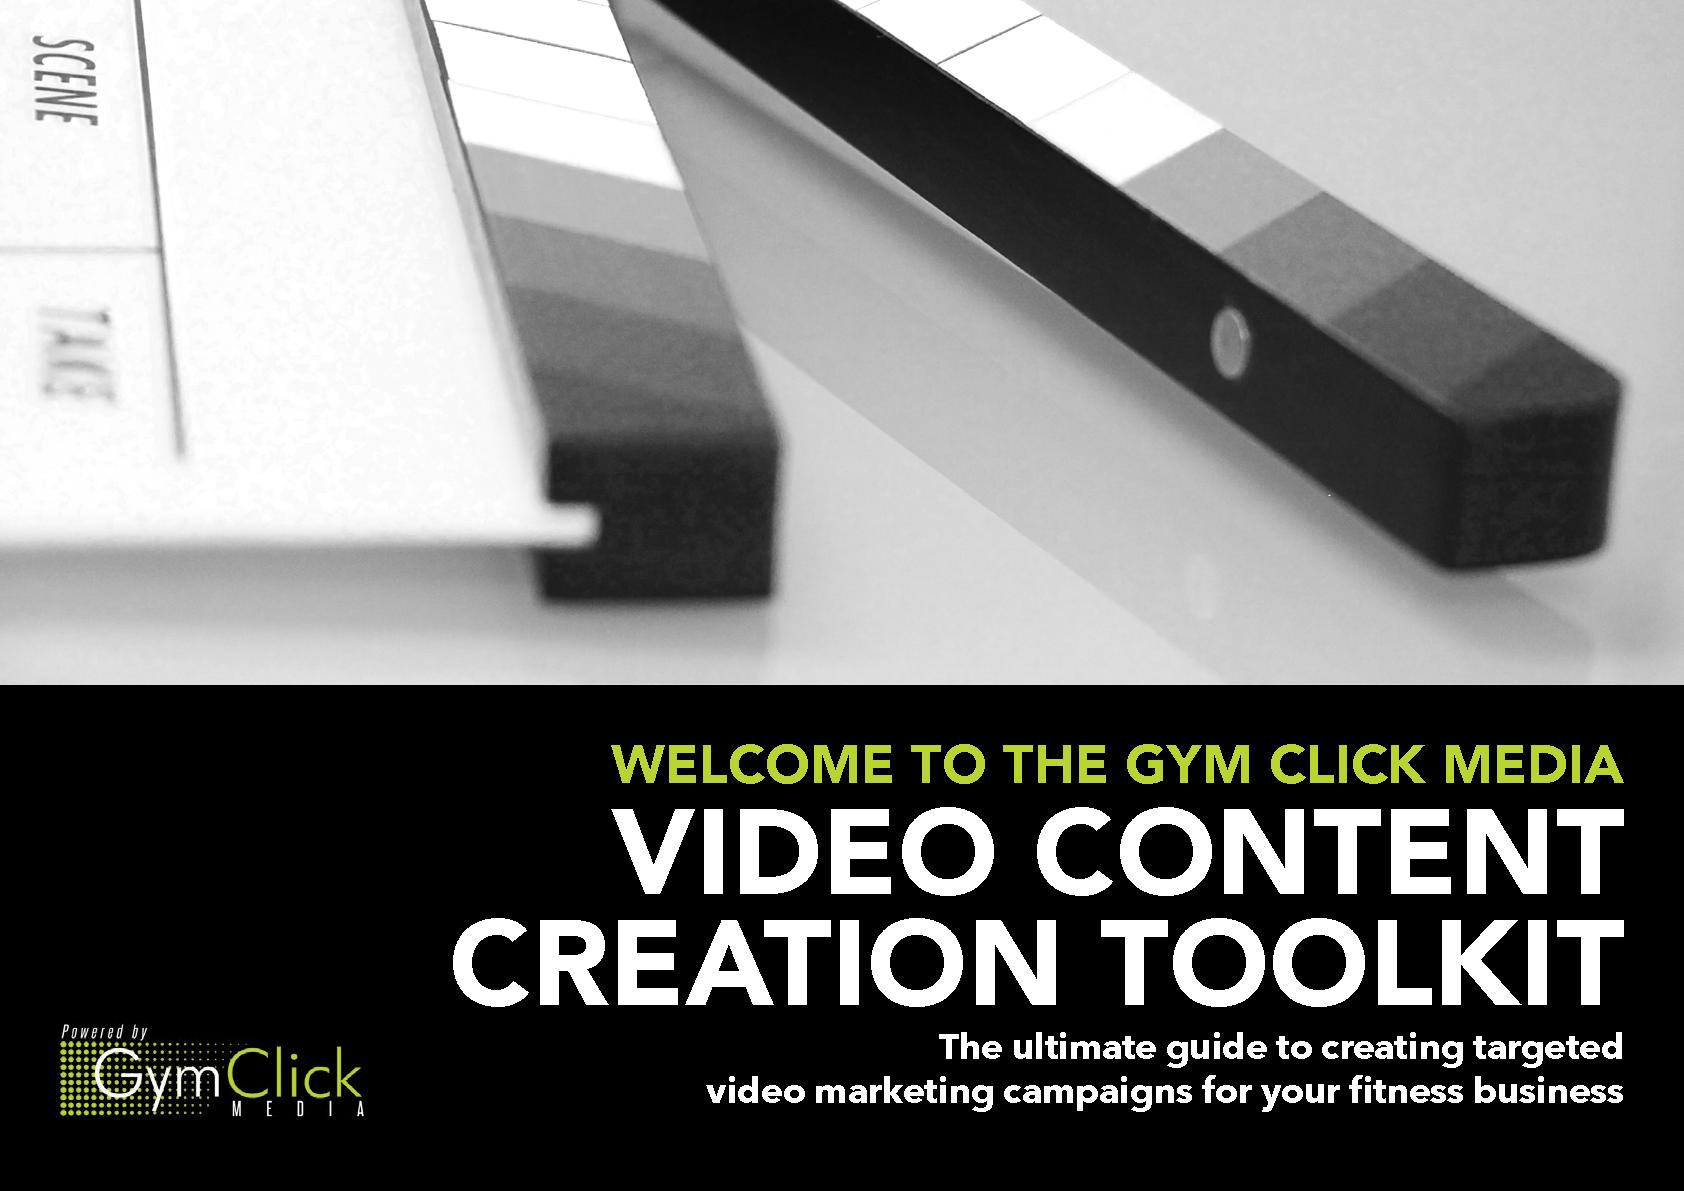 Gym Click Media Video Toolkit PDF